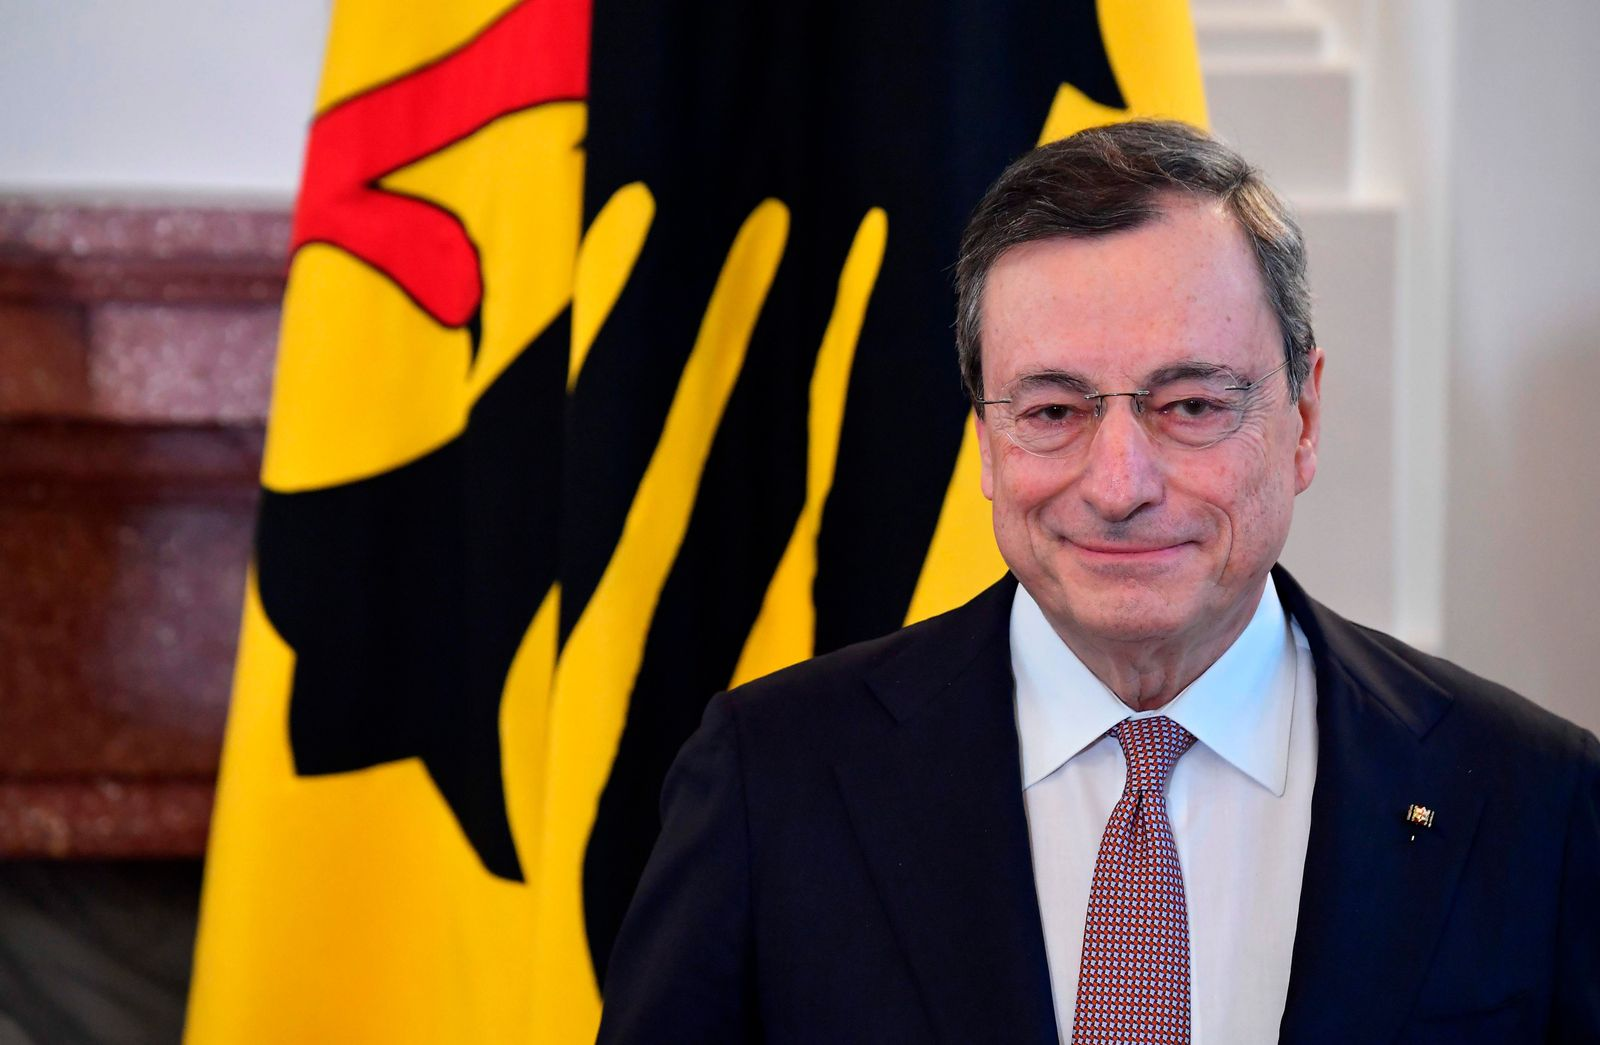 GERMANY-ECB-BANKING-DRAGHI-AWARD